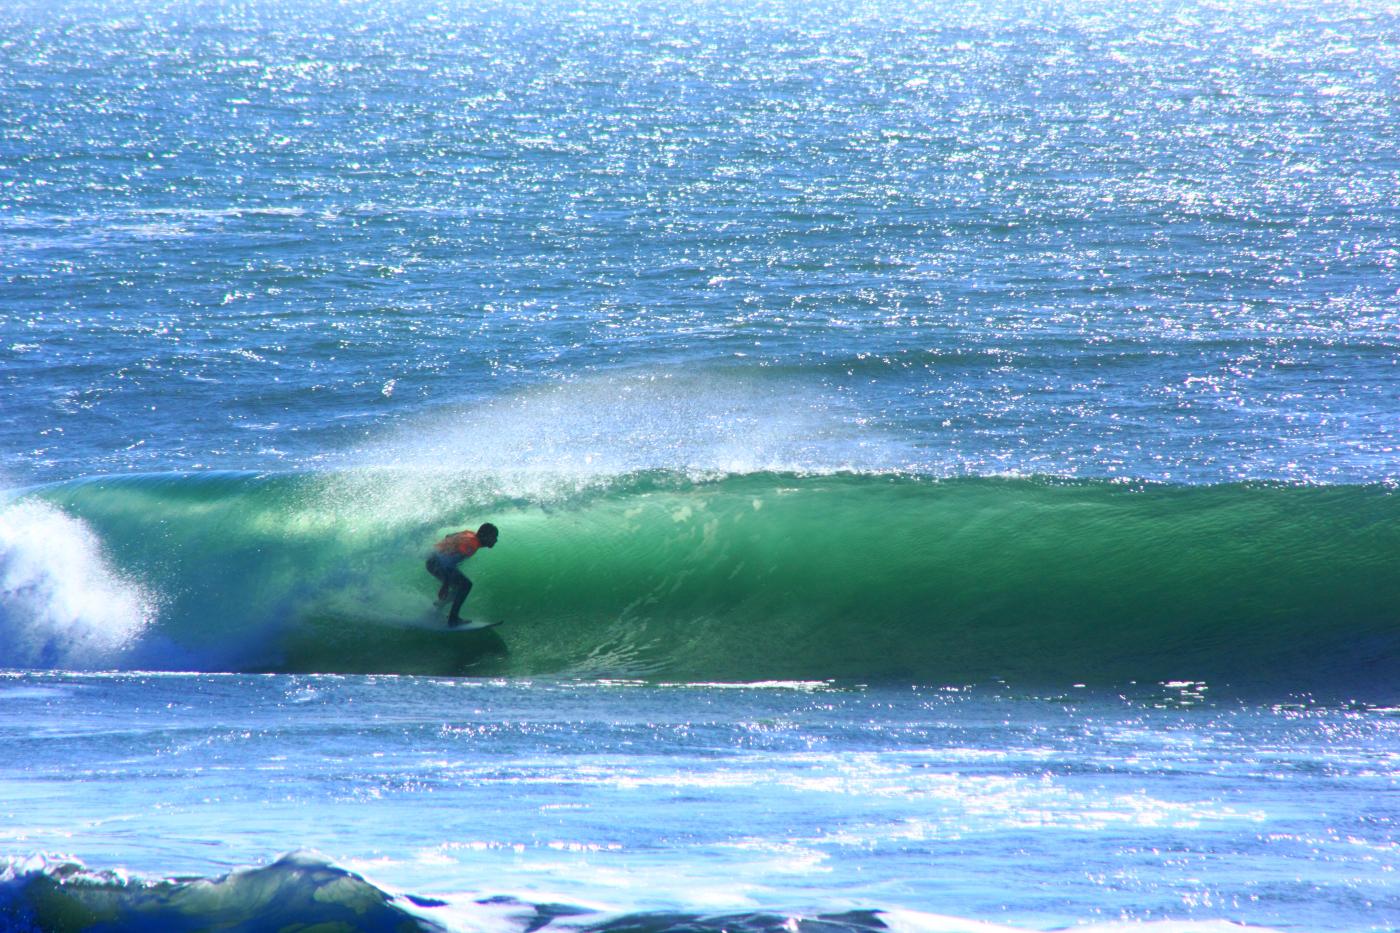 Imagen de un surfista